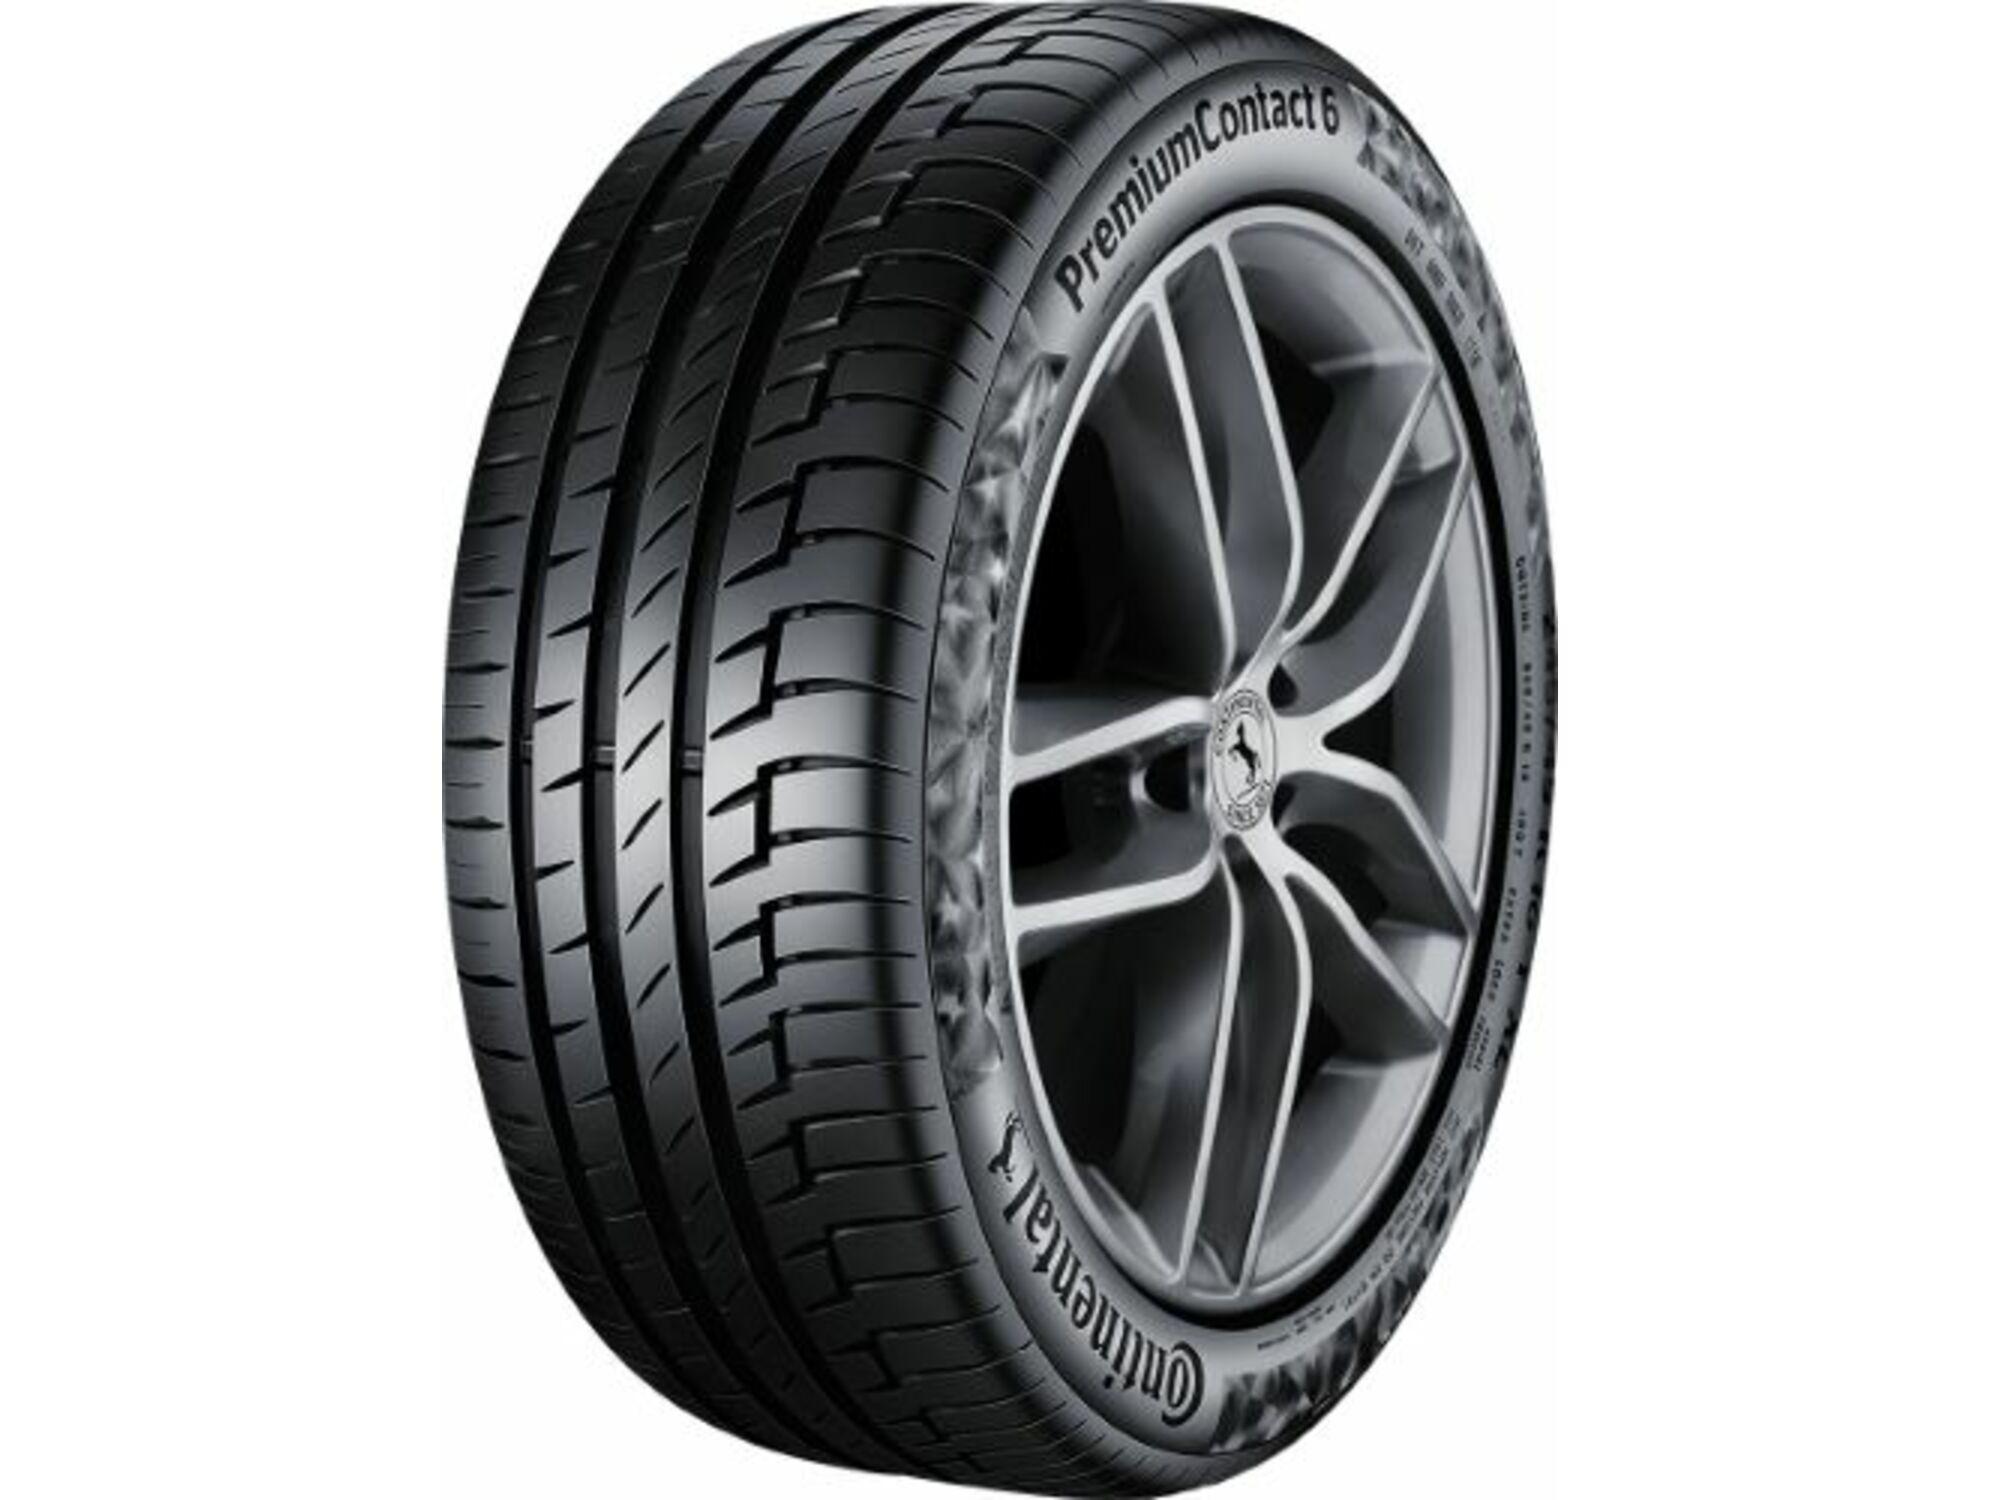 CONTINENTAL Letne pnevmatike    PremiumContact 6 205/55R16 91H